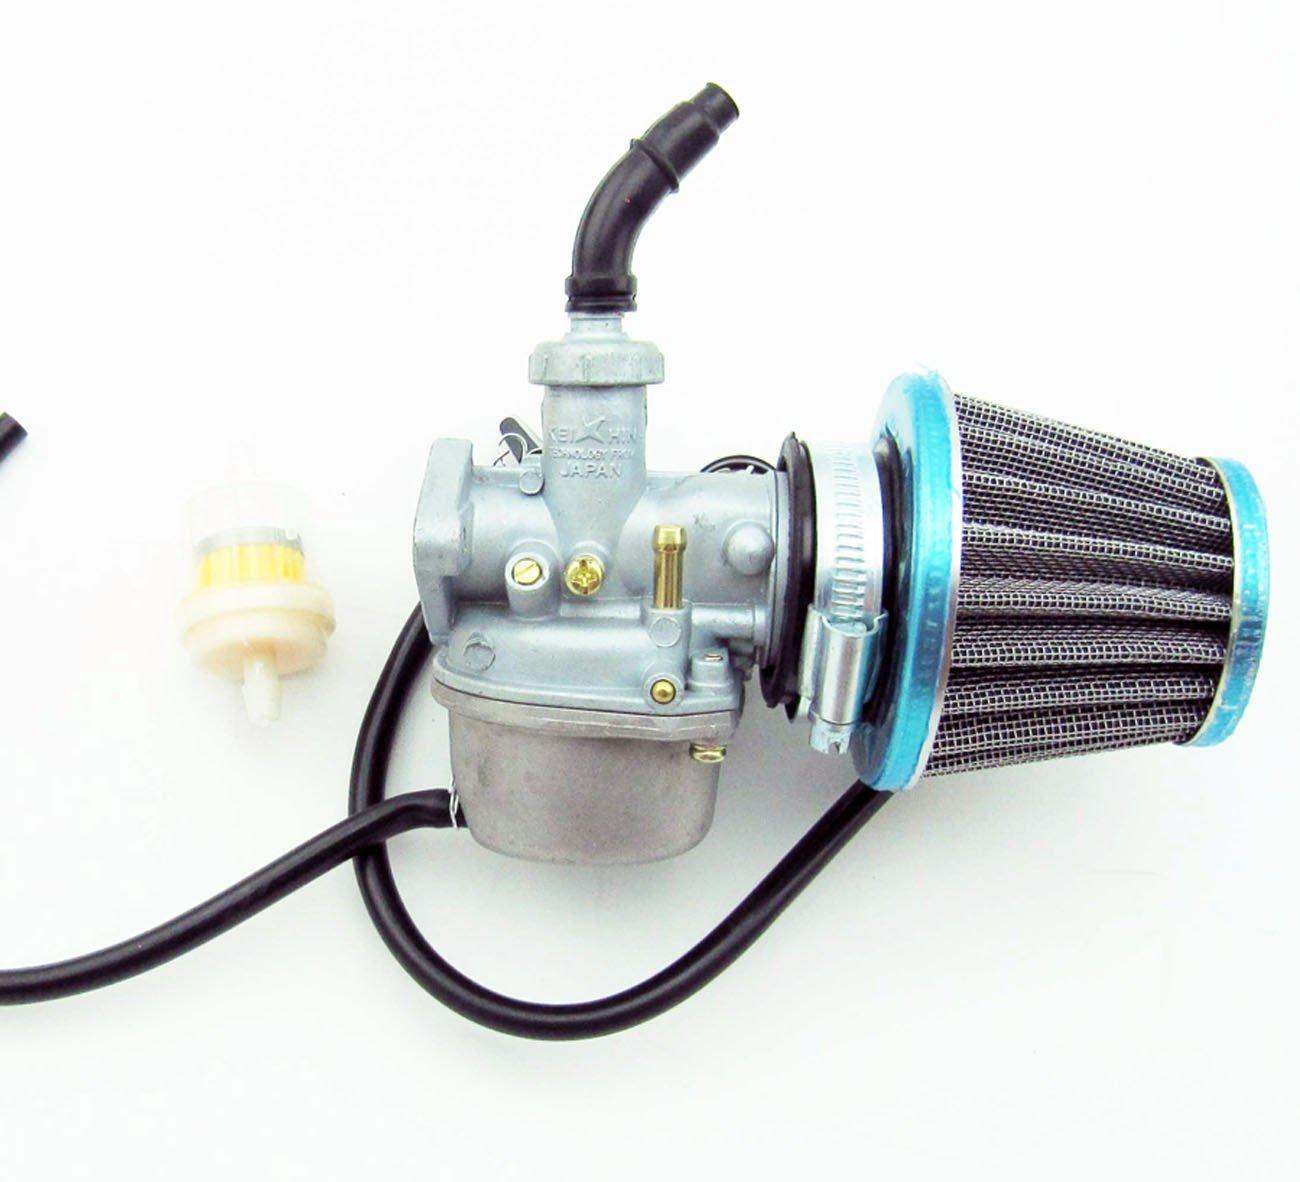 EVINIS ATV Carburetor PZ19 35mm Air Filter for 50cc 70cc 90cc 110cc 125cc ATV Dirt Pit Bike Taotao Honda CRF